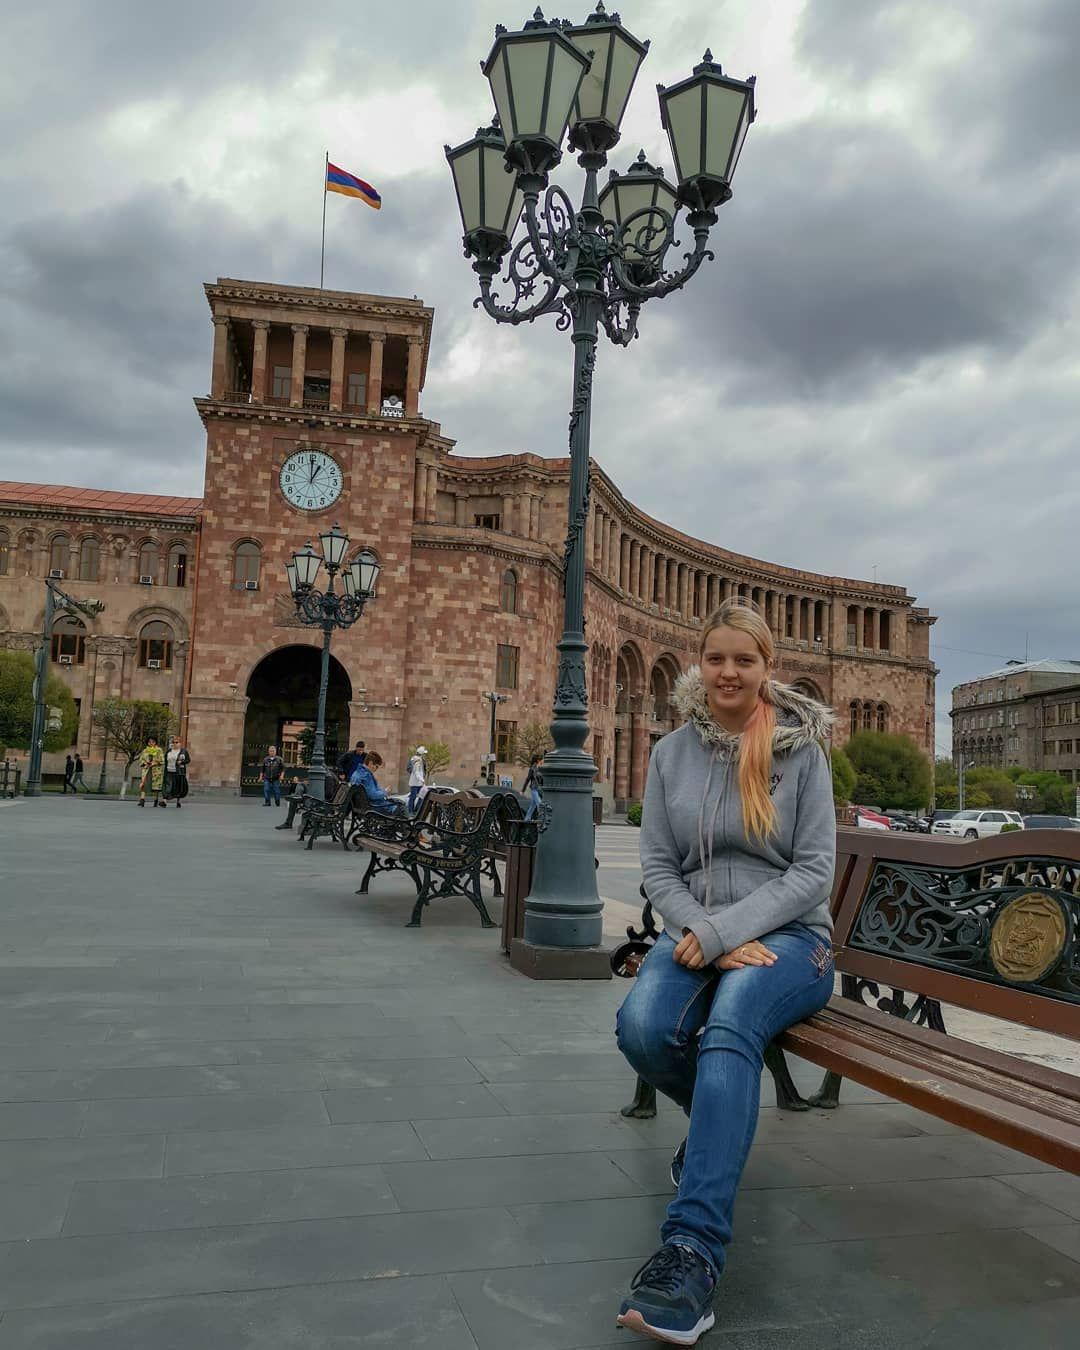 [New] The 10 Best Travel (with Pictures) -  Ереван барев! #армения #ереван #travel #armenia #erevan #путешествие